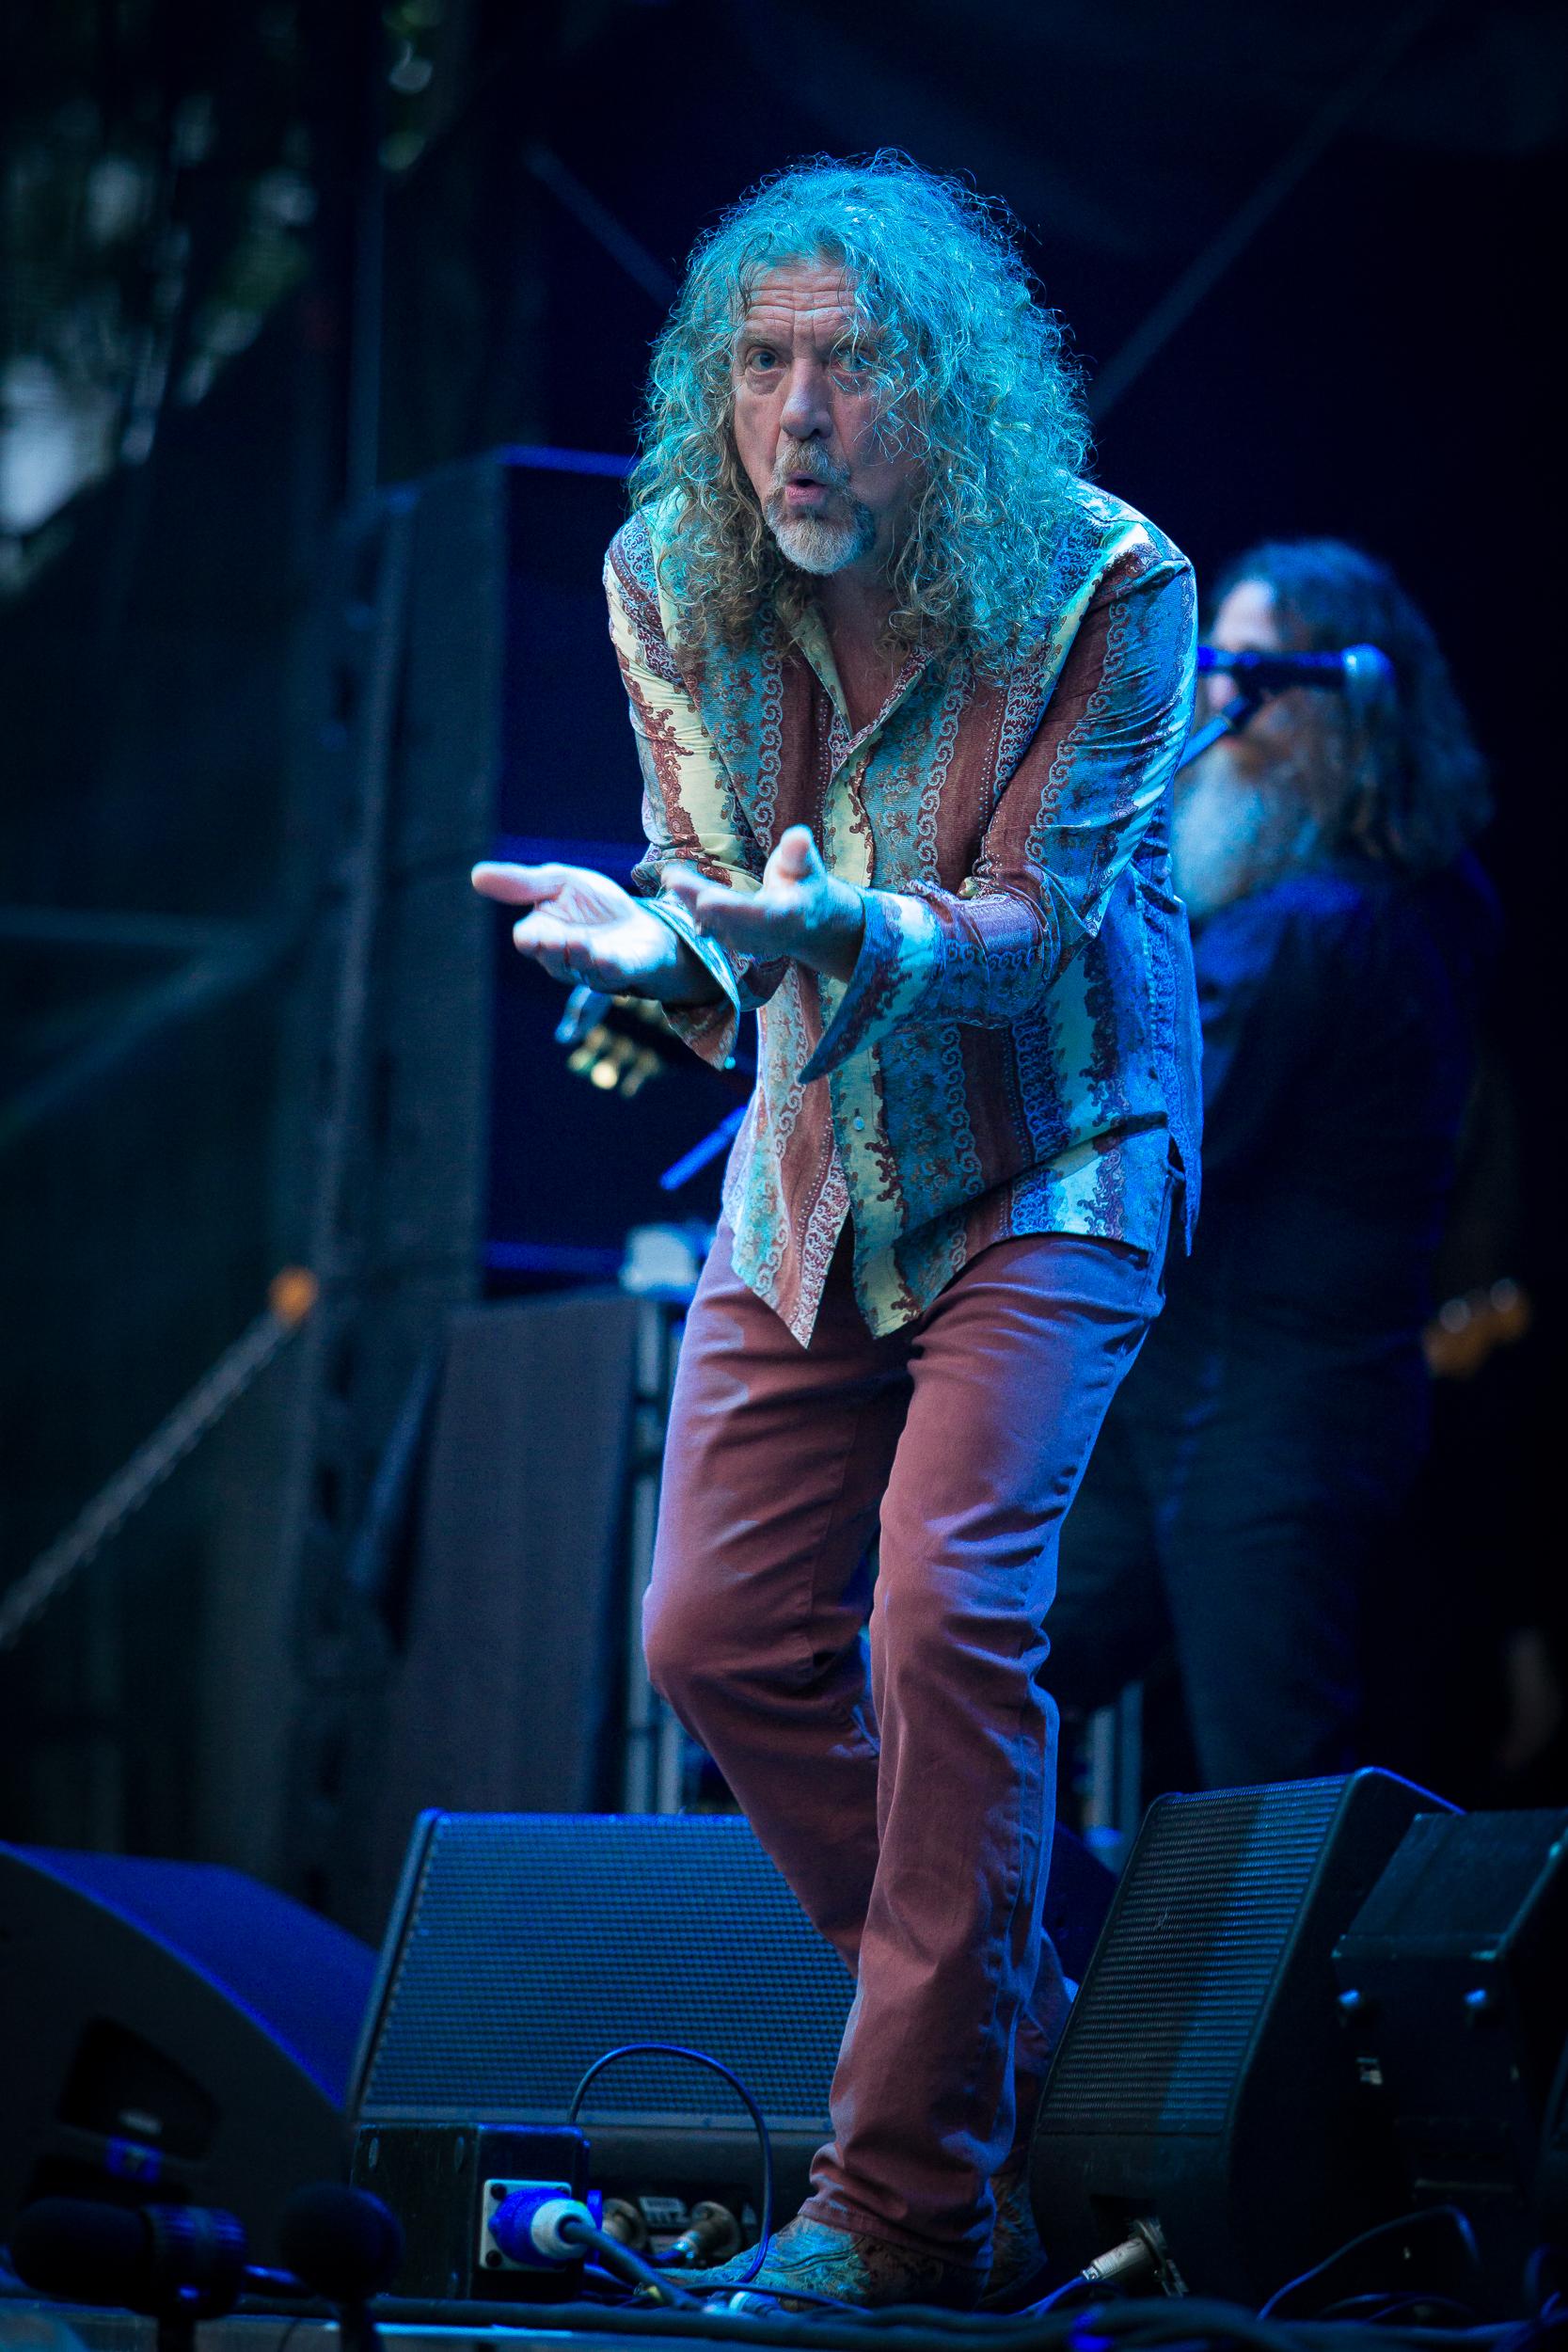 Robert Plant live at Bergenfest 2014, Bergen.